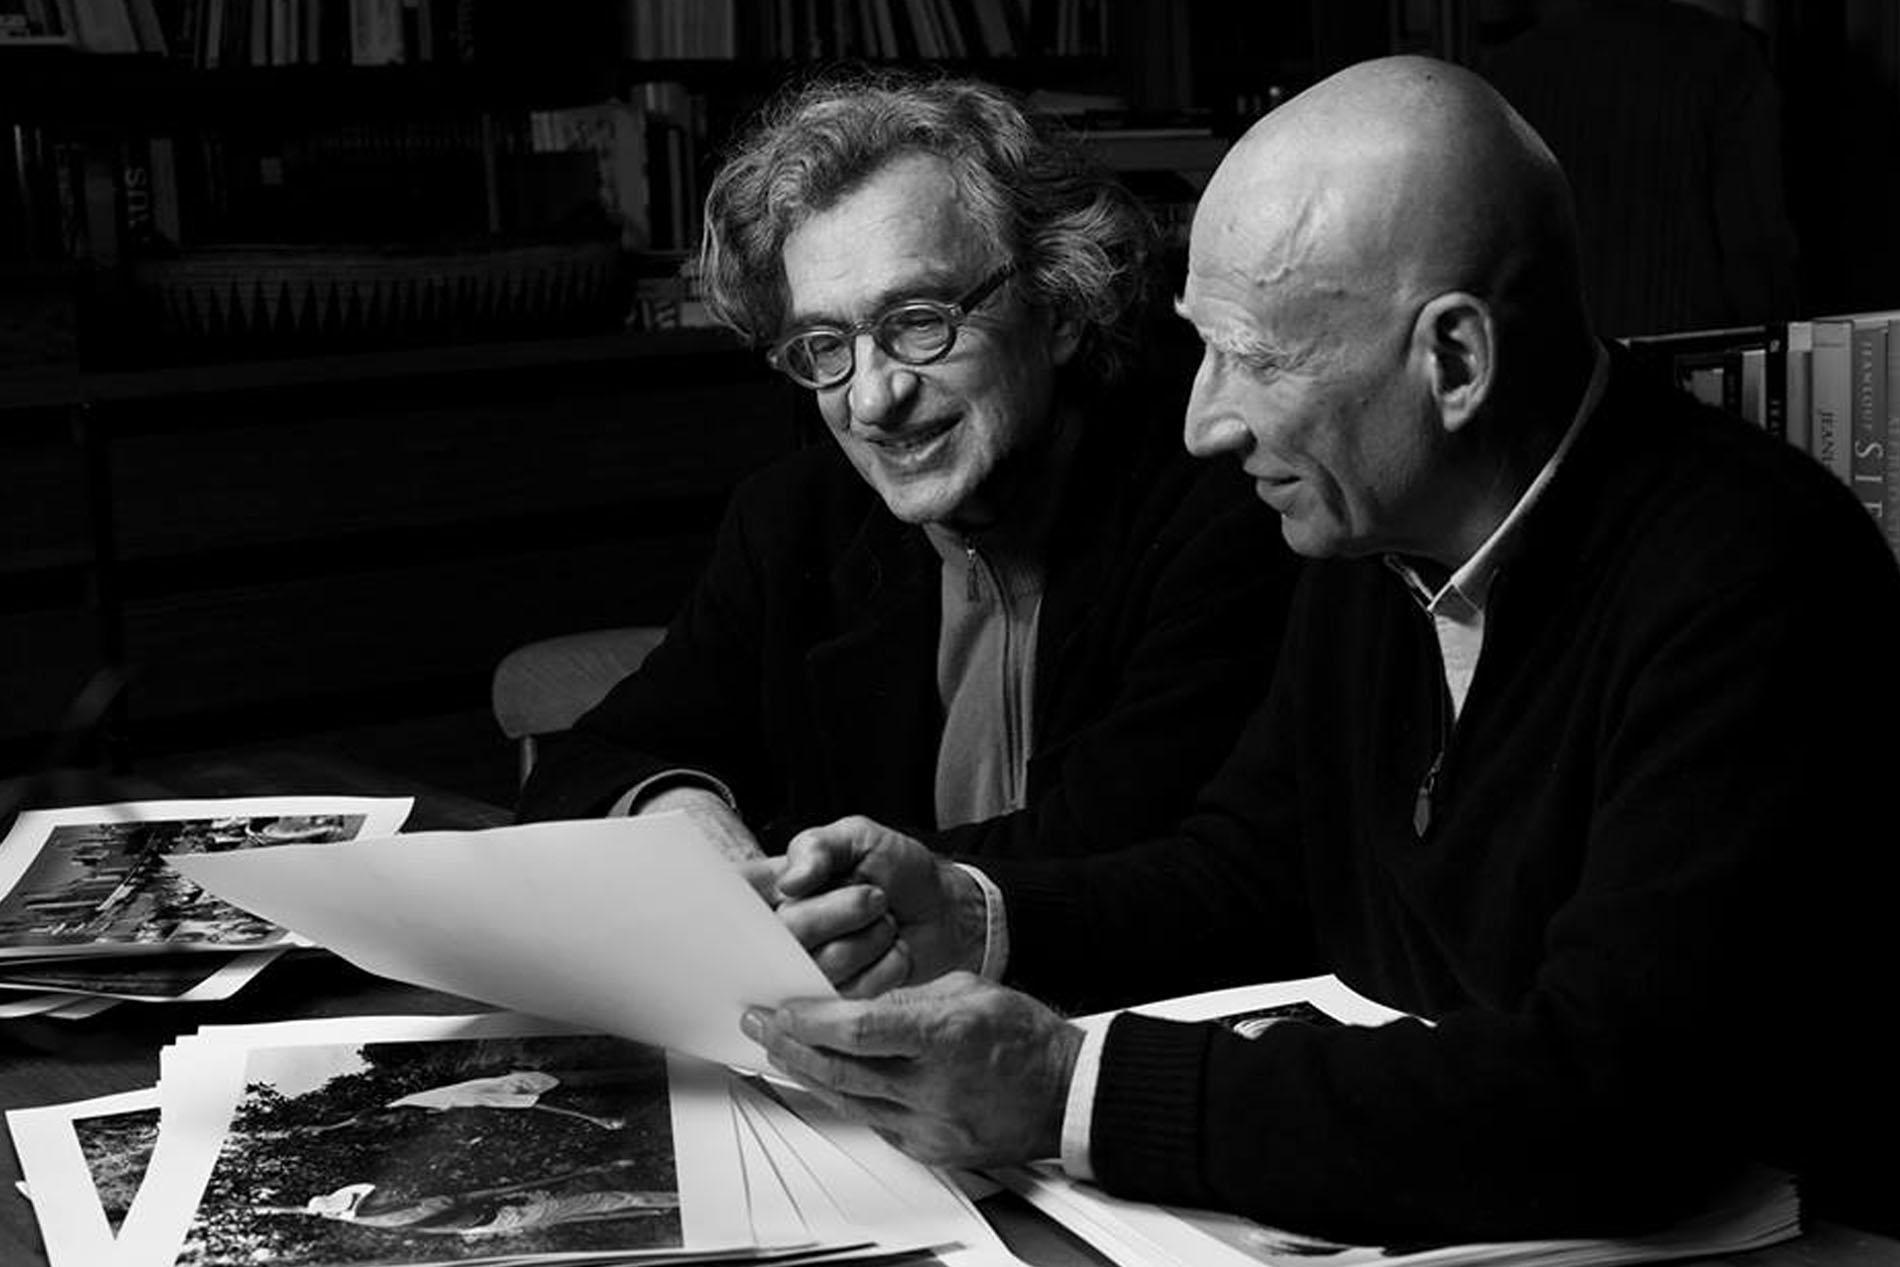 Wim Wenders - Der Himmel über Berlin, die Berlinale und die Oscars